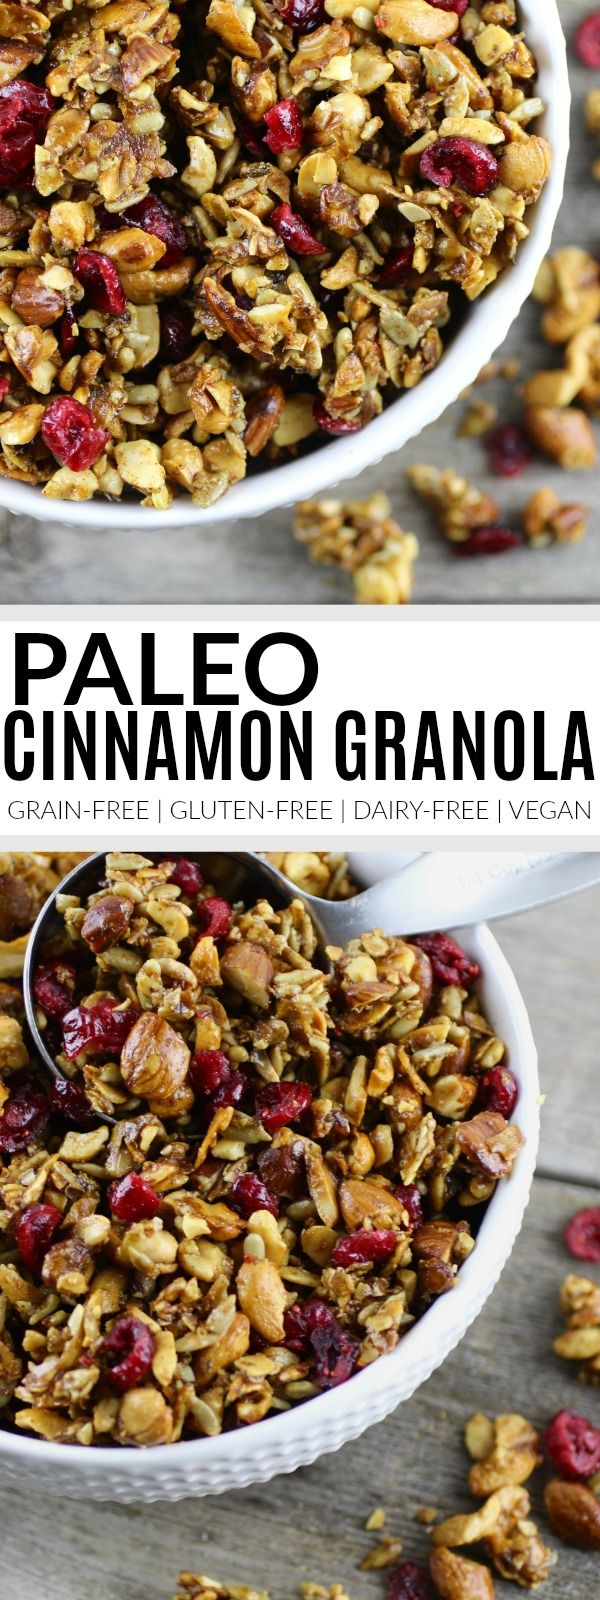 Paleo Granola Recipe   grain-free granola recipe   gluten-free granola recipe   dairy-free granola recipe   vegan granola recipe   healthy granola recipes   paleo snack recipes    The Real Food Dietitians #paleosnacks #glutenfreegranola #healthysnacks